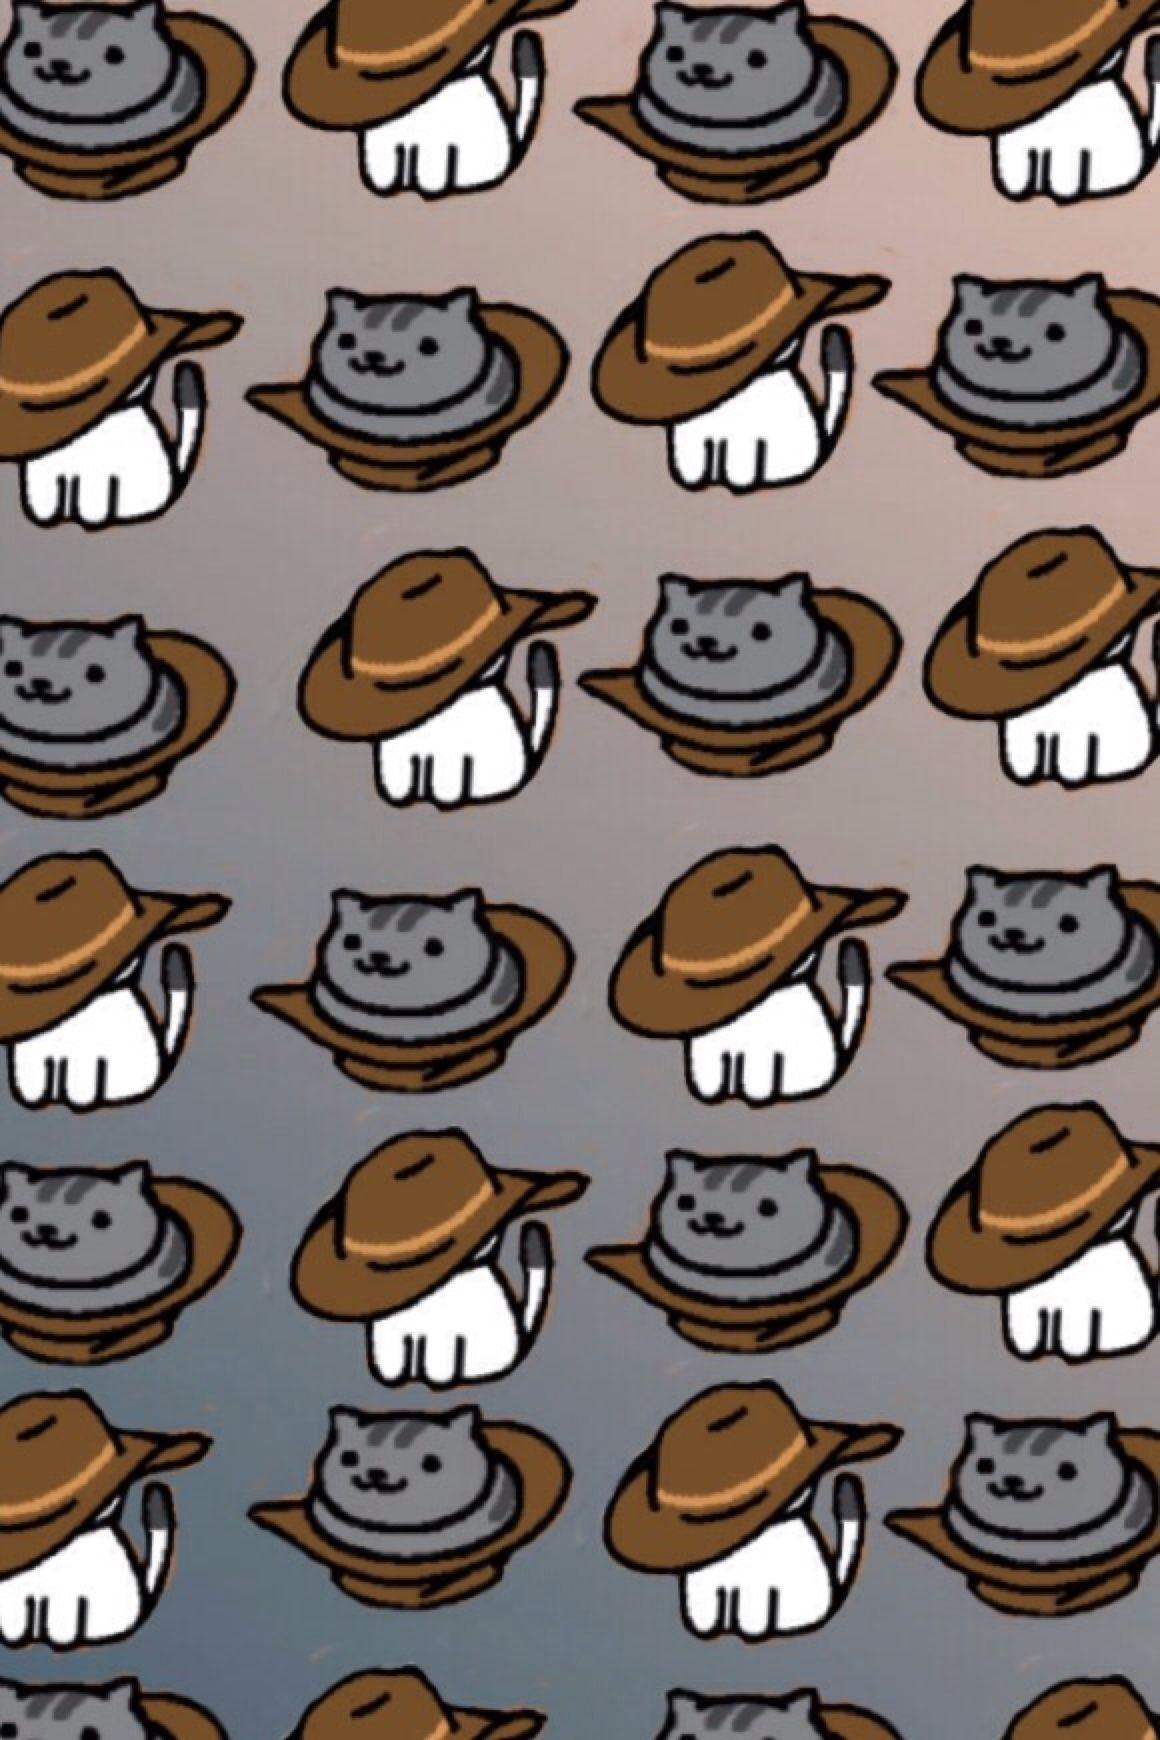 Neko Atsume Wallpapers - Wallpaper Cave